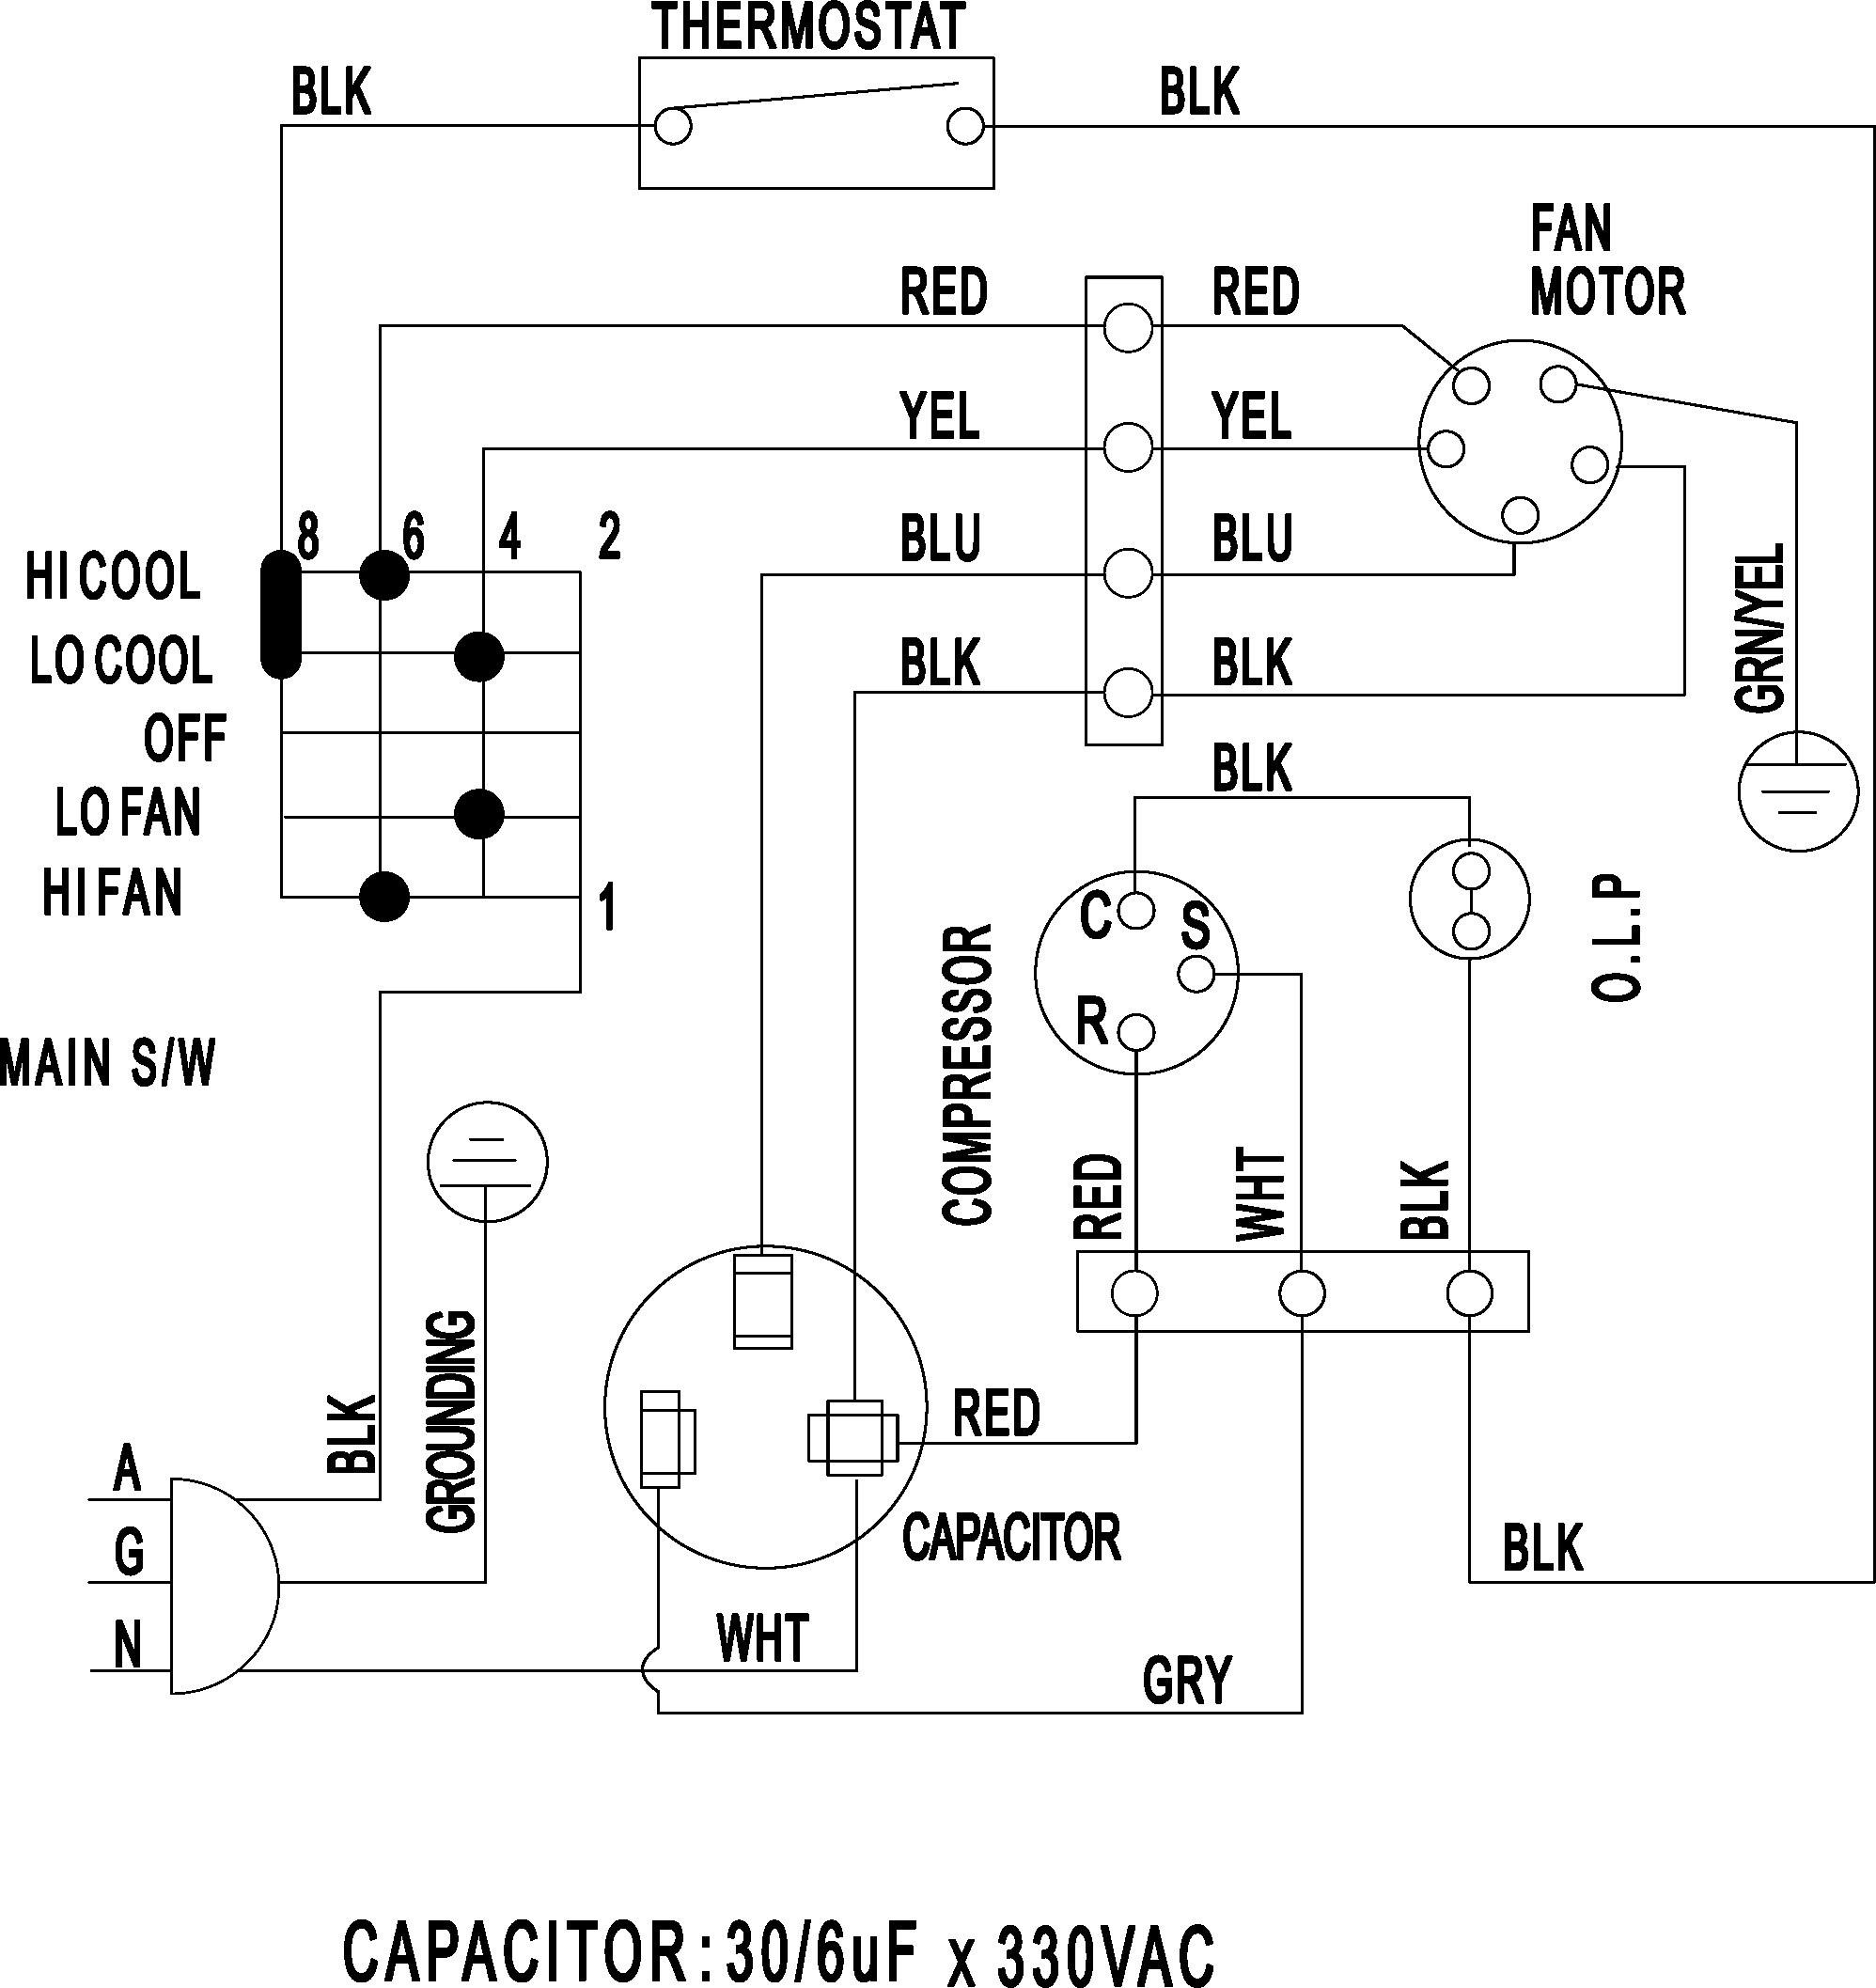 Ac Unit Wiring | Wiring Diagram - Ac Condenser Wiring Diagram